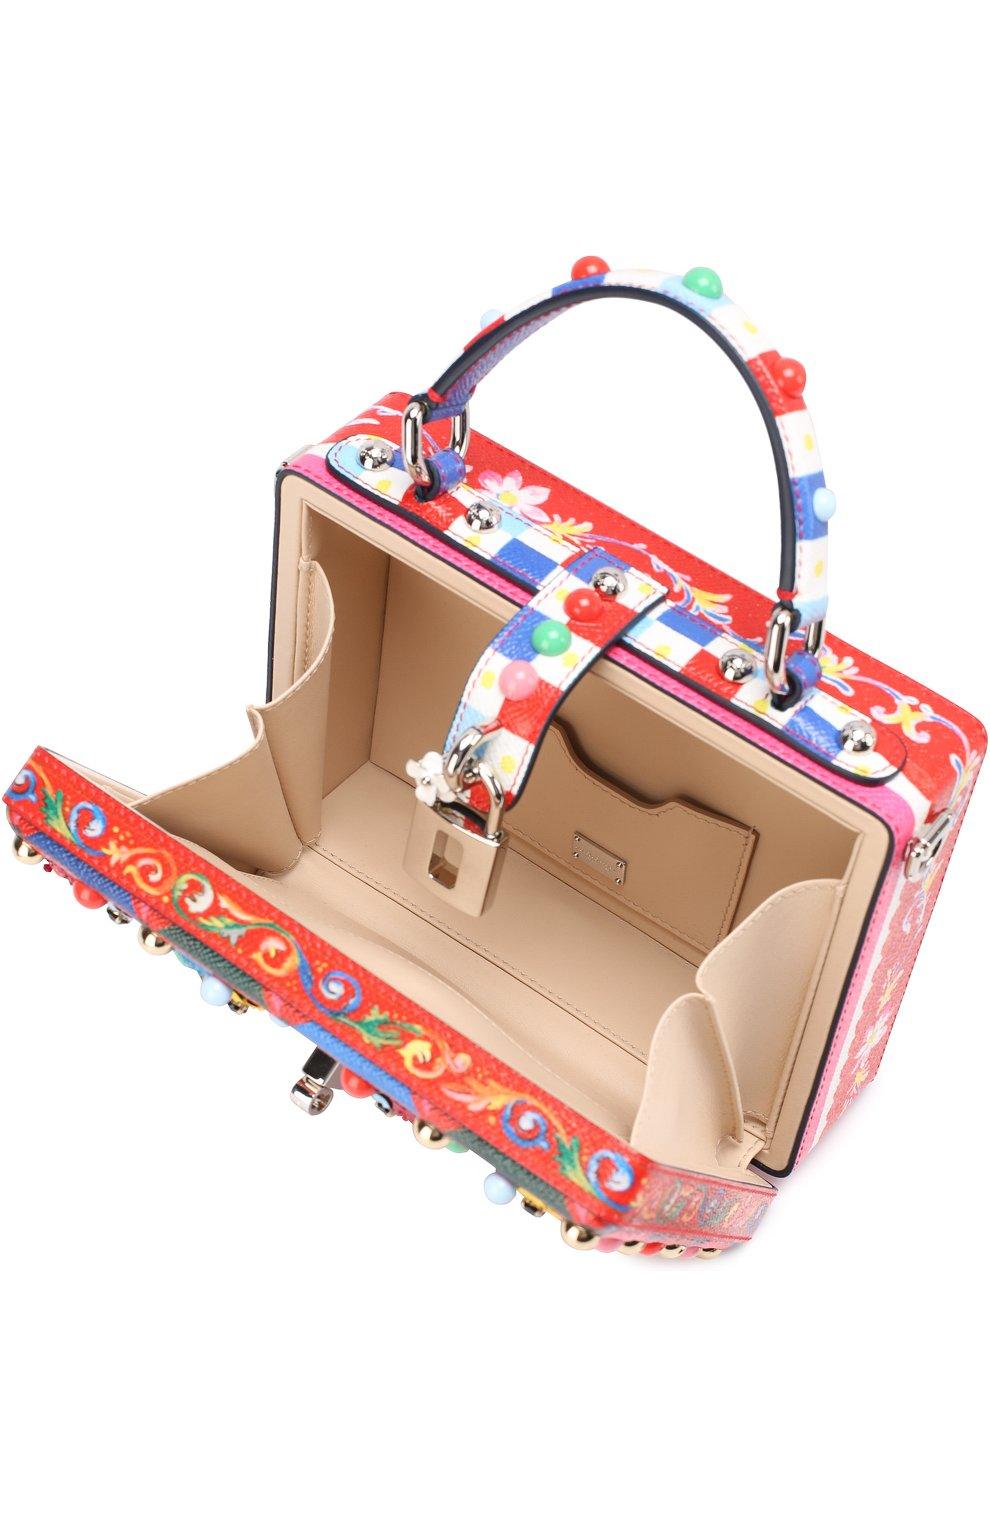 Сумка Dolce Box с декоративной отделкой | Фото №4